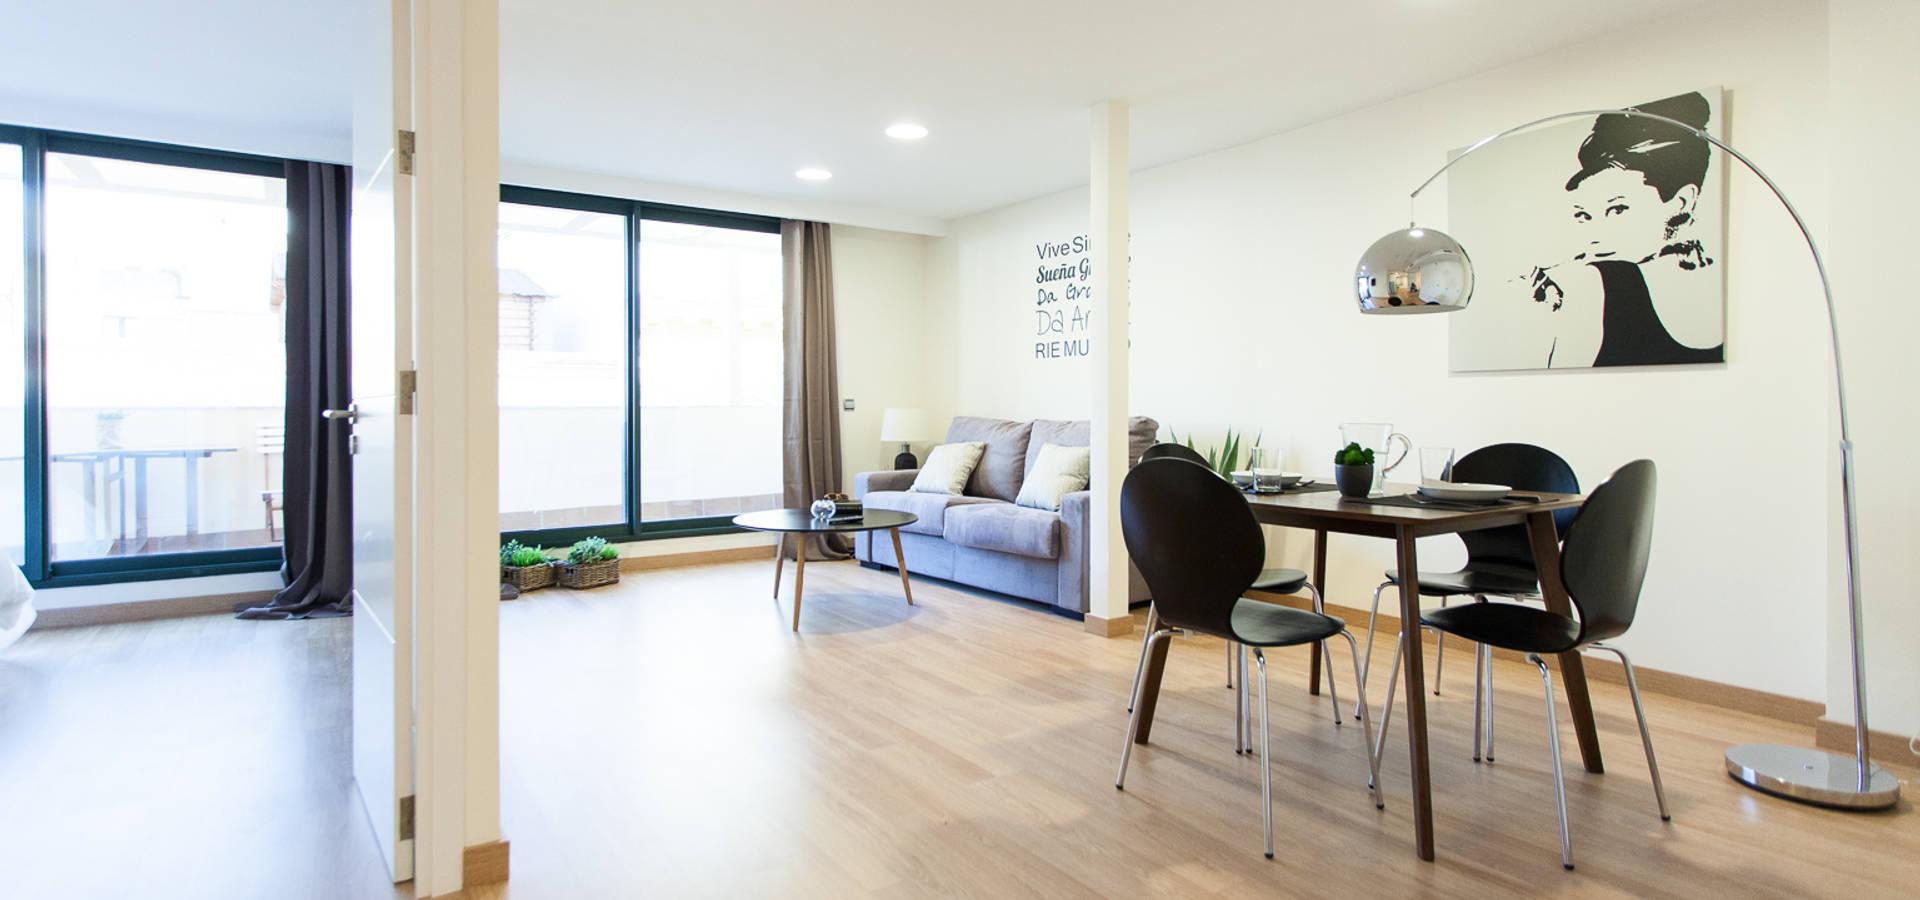 Inuk Home Studio